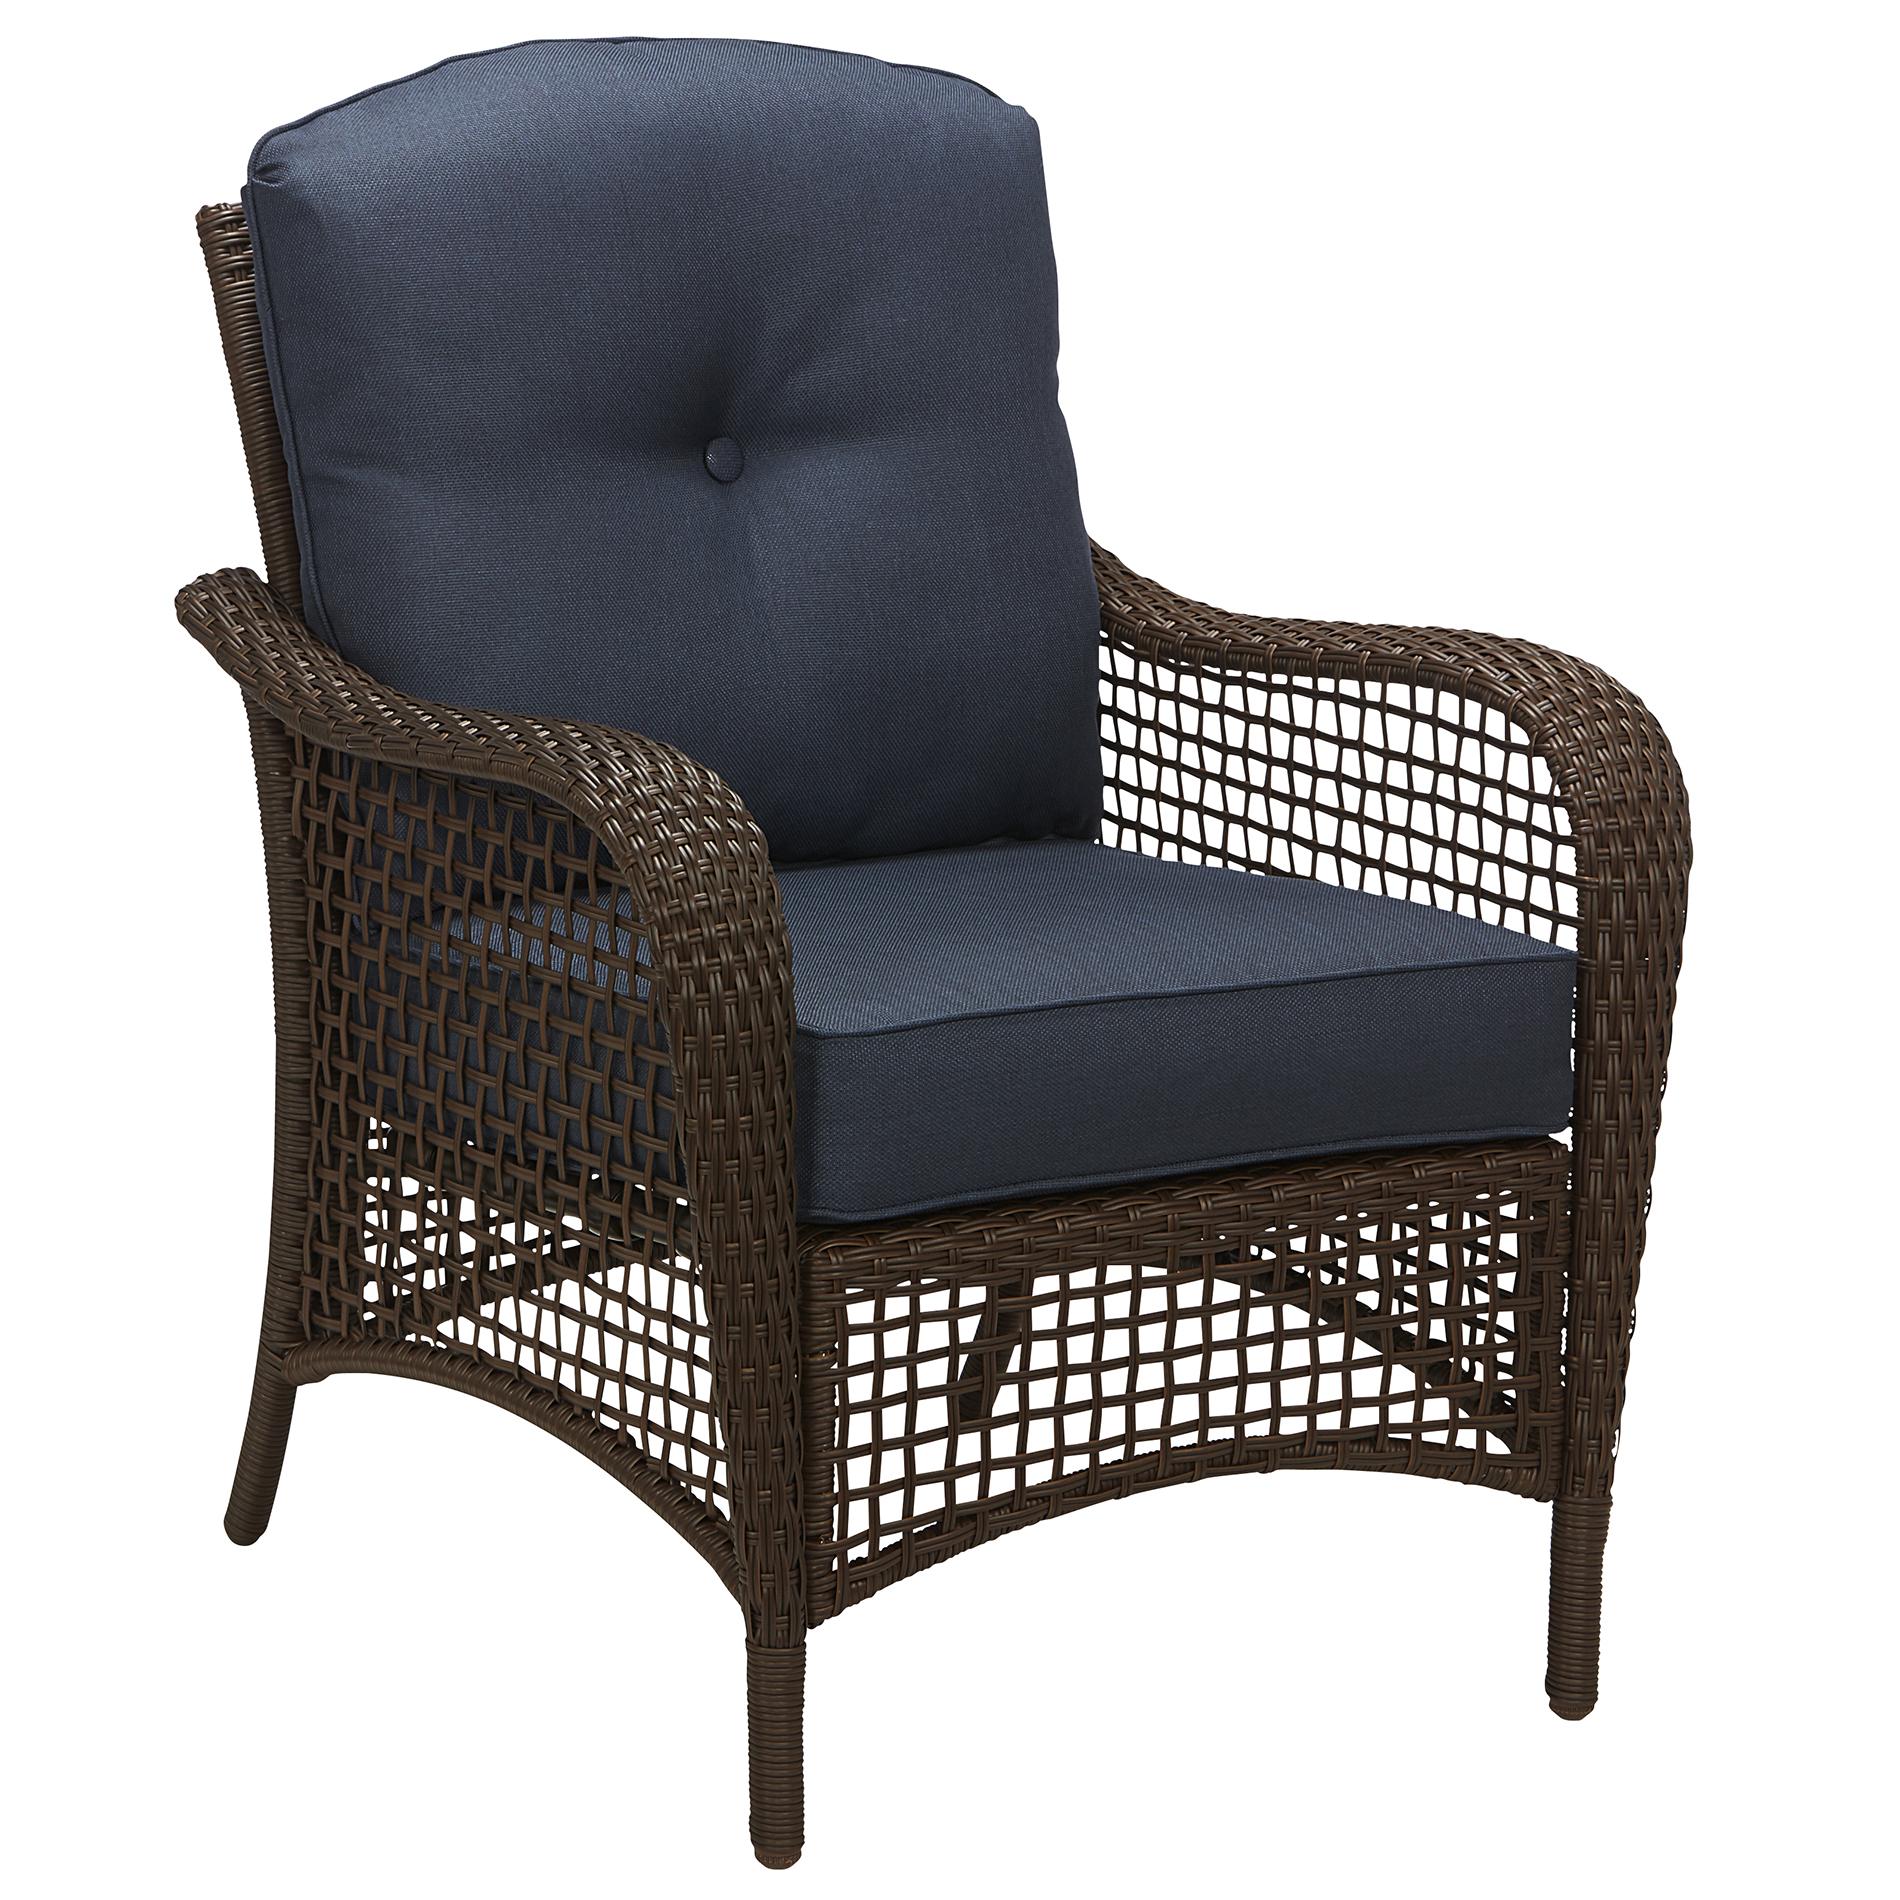 Grand Harbor Prairie Hill Stationary Chair- Blue - Outdoor